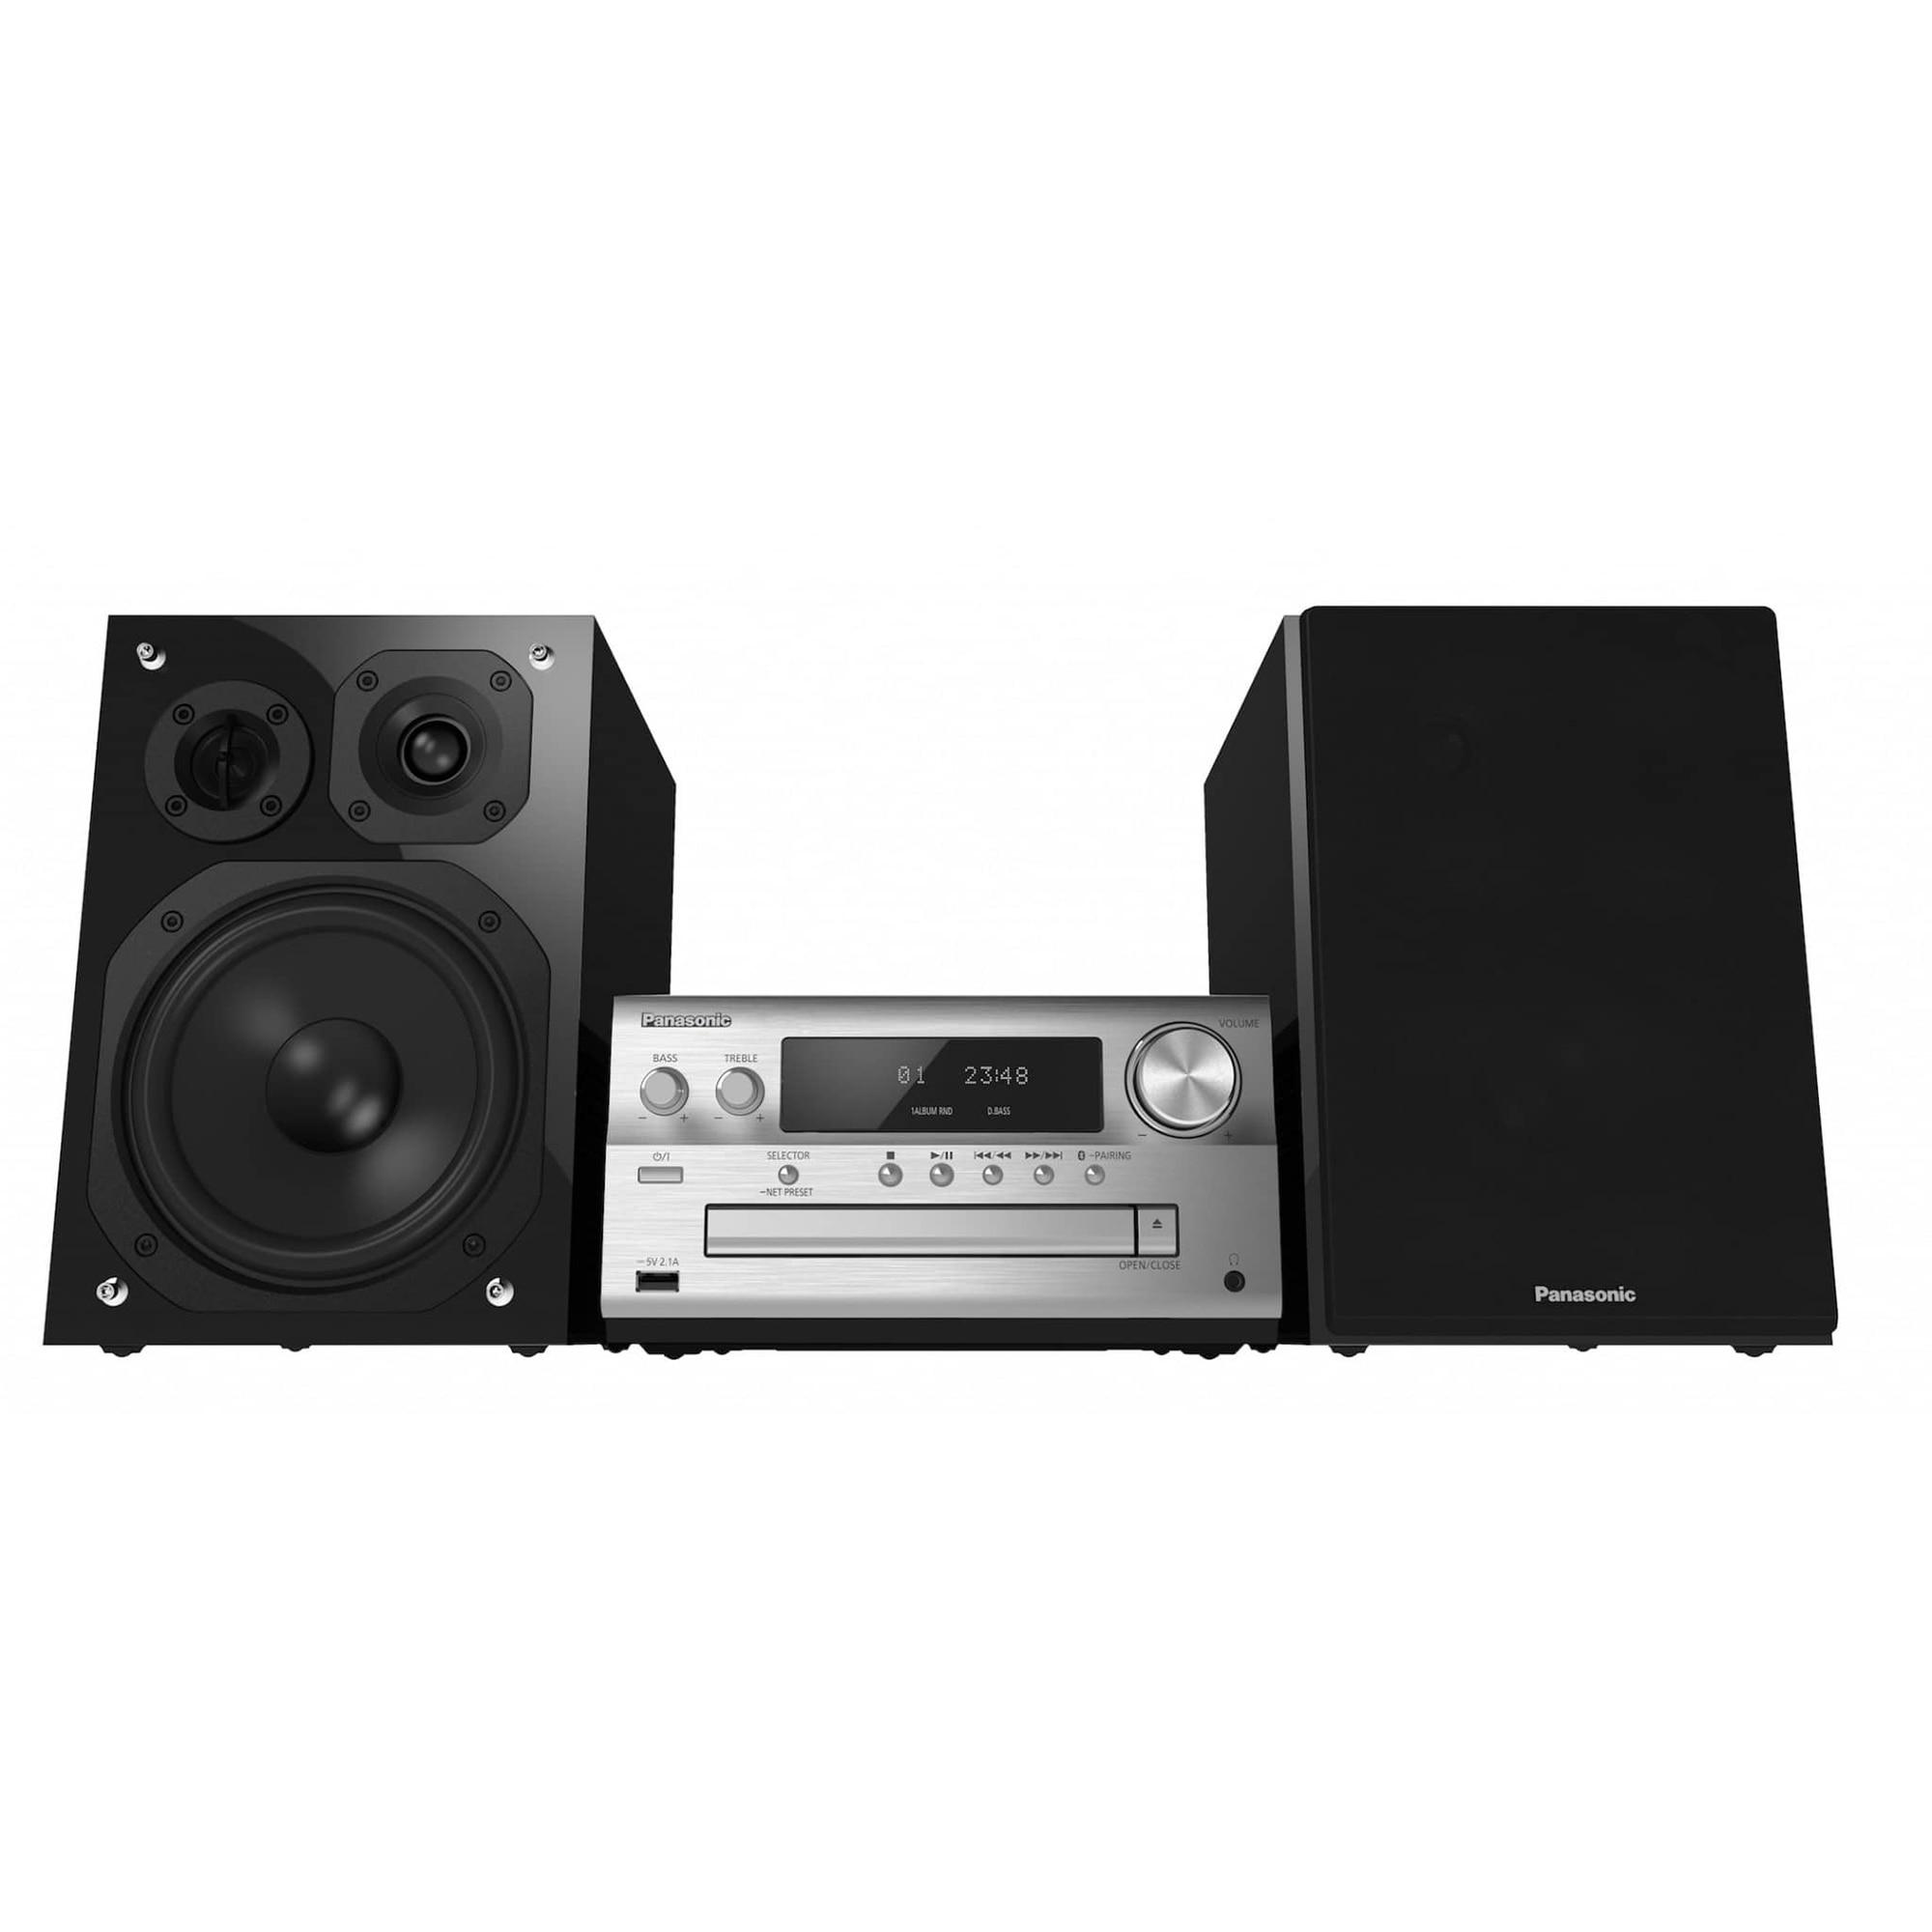 Fotografie Microsistem audio High-Res Panasonic SC-PMX90EG-S, 120W, BT, USB-DAC, Lincs D-Amp, Difuzoare 3 cai, Optical-in, Argintiu